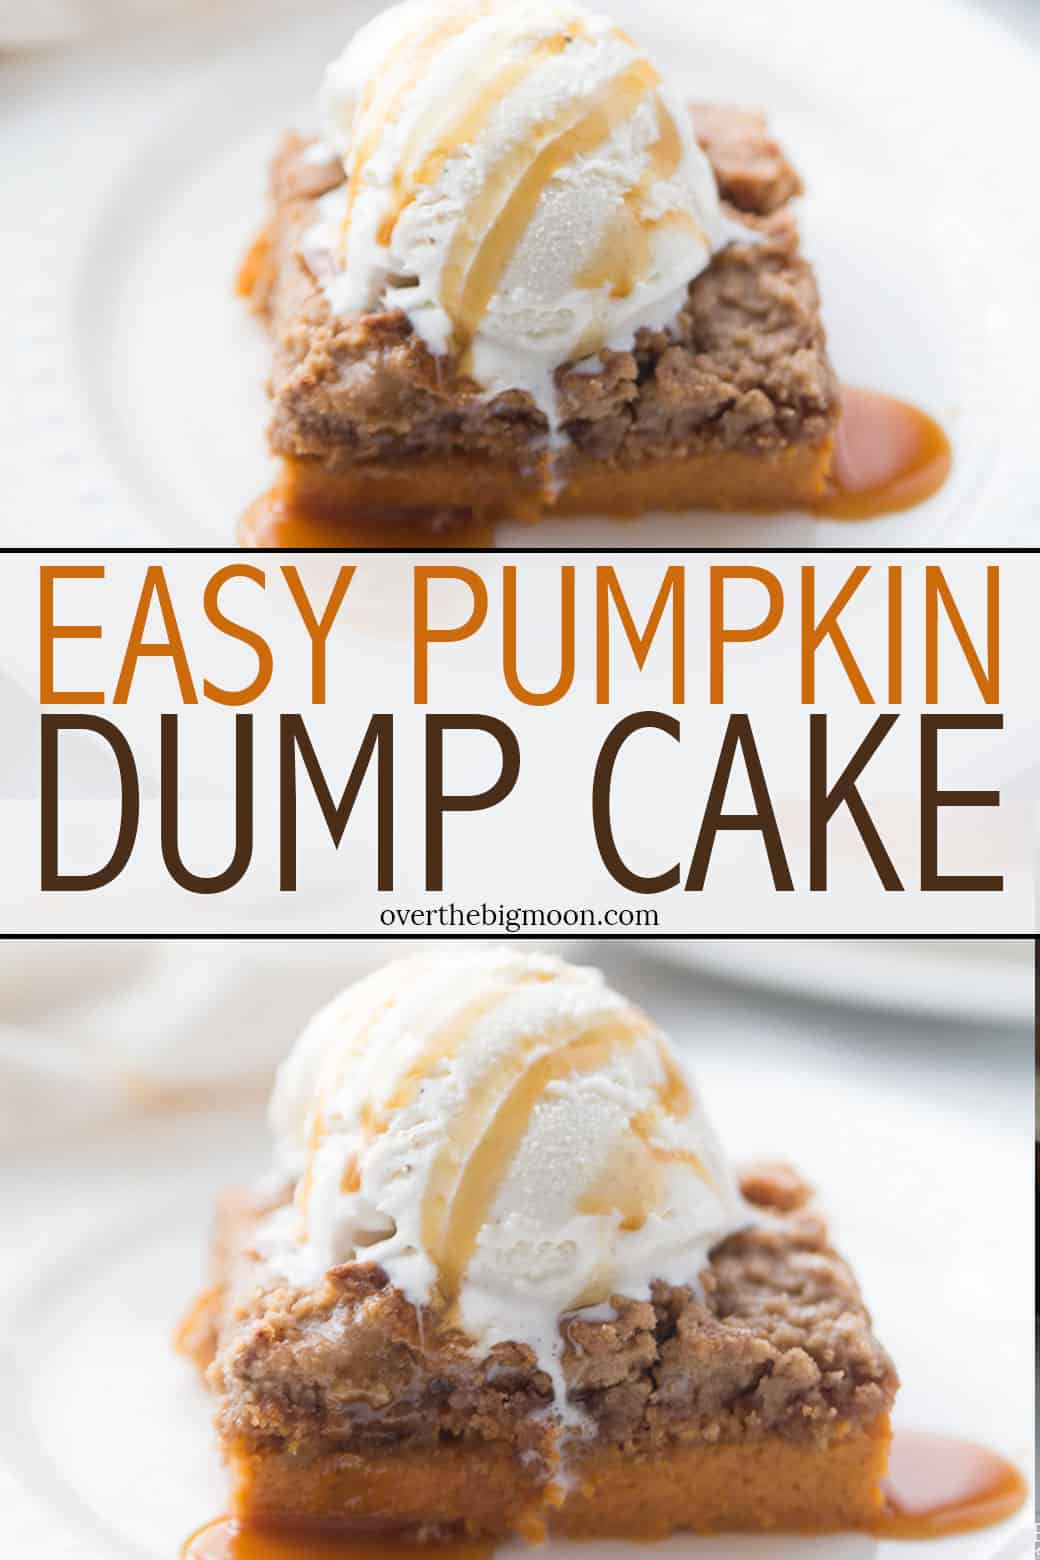 Super Easy Pumpkin Dump Cake Recipe - the perfect Fall treat! From overthebigmoon.com!